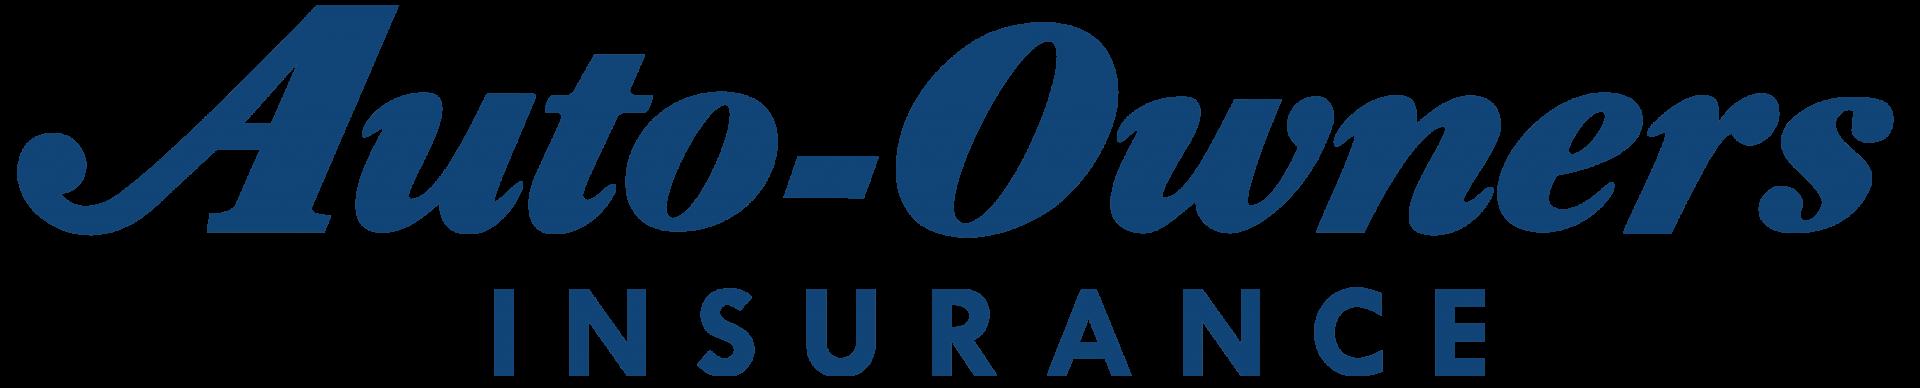 Auto Owners Insurance Provo Utah logo